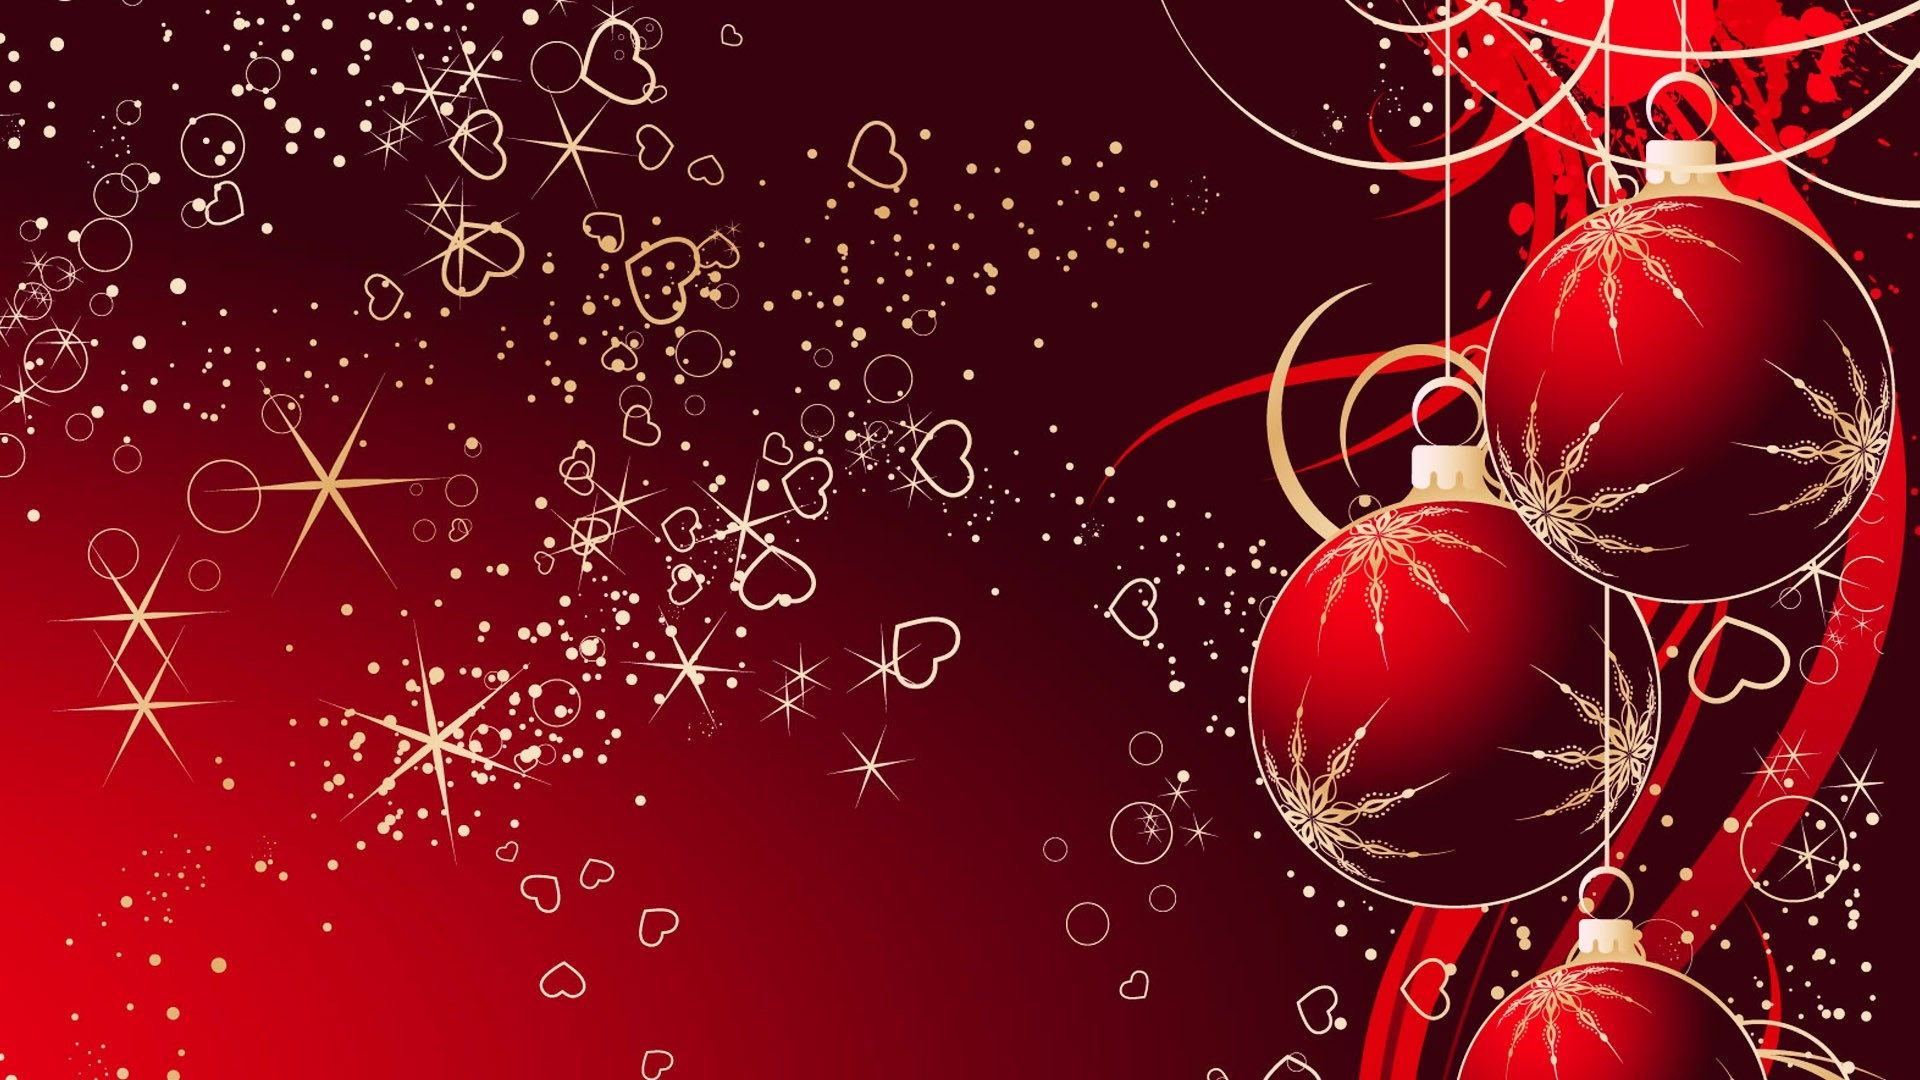 Beautiful Christmas Full HD Wallpaper #7433 Wallpaper computer | best .